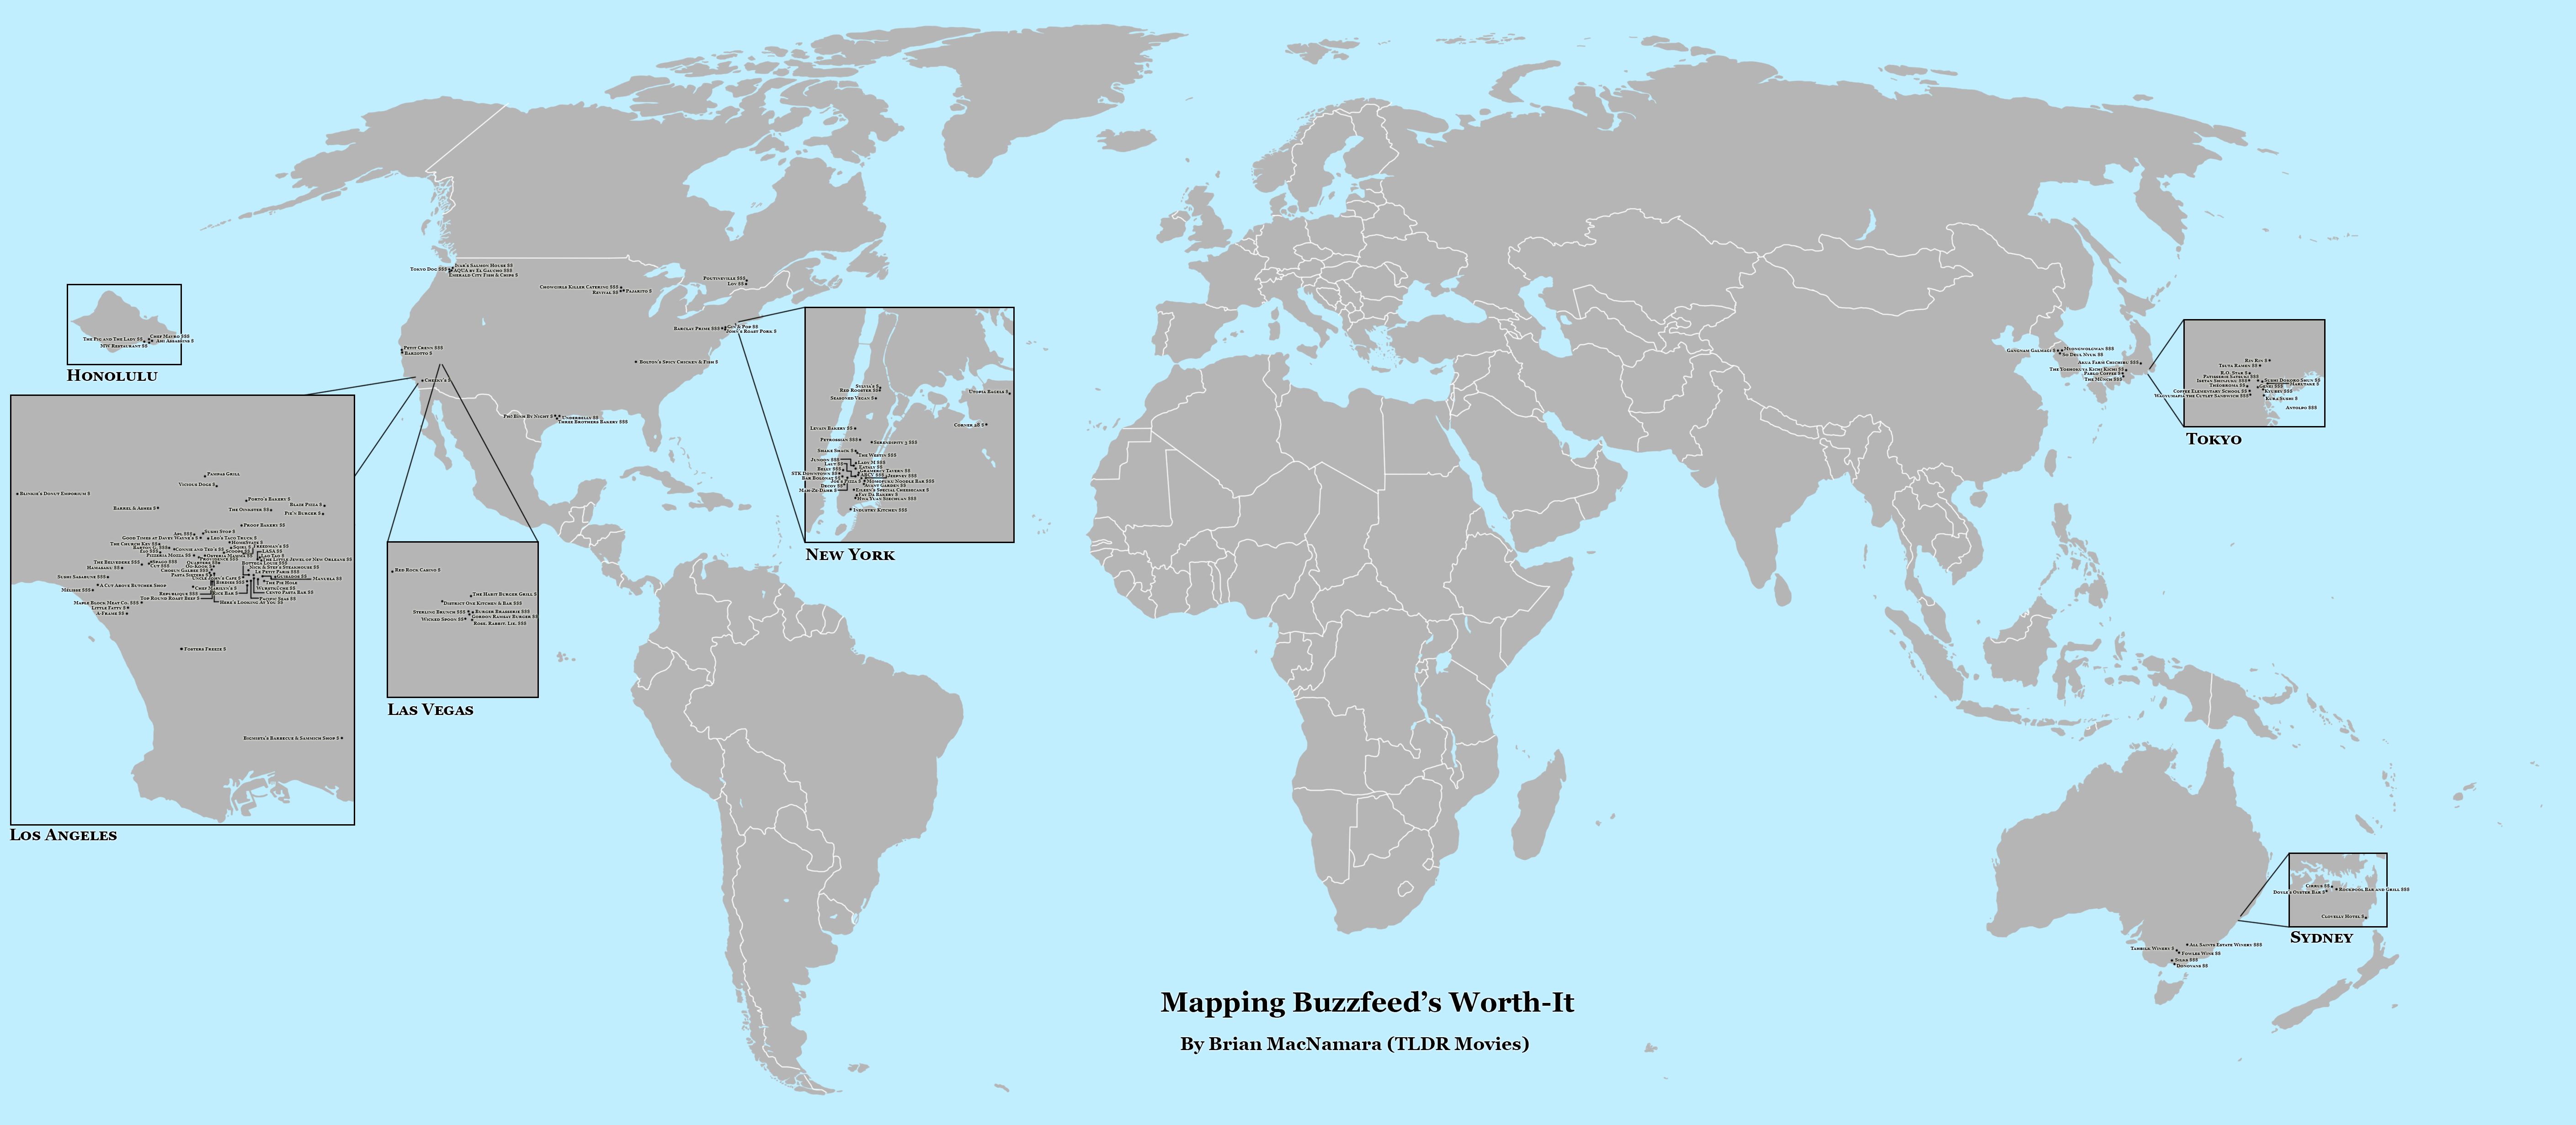 Full Globe Map of Worth-It. Image Credit: Brian MacNamara.